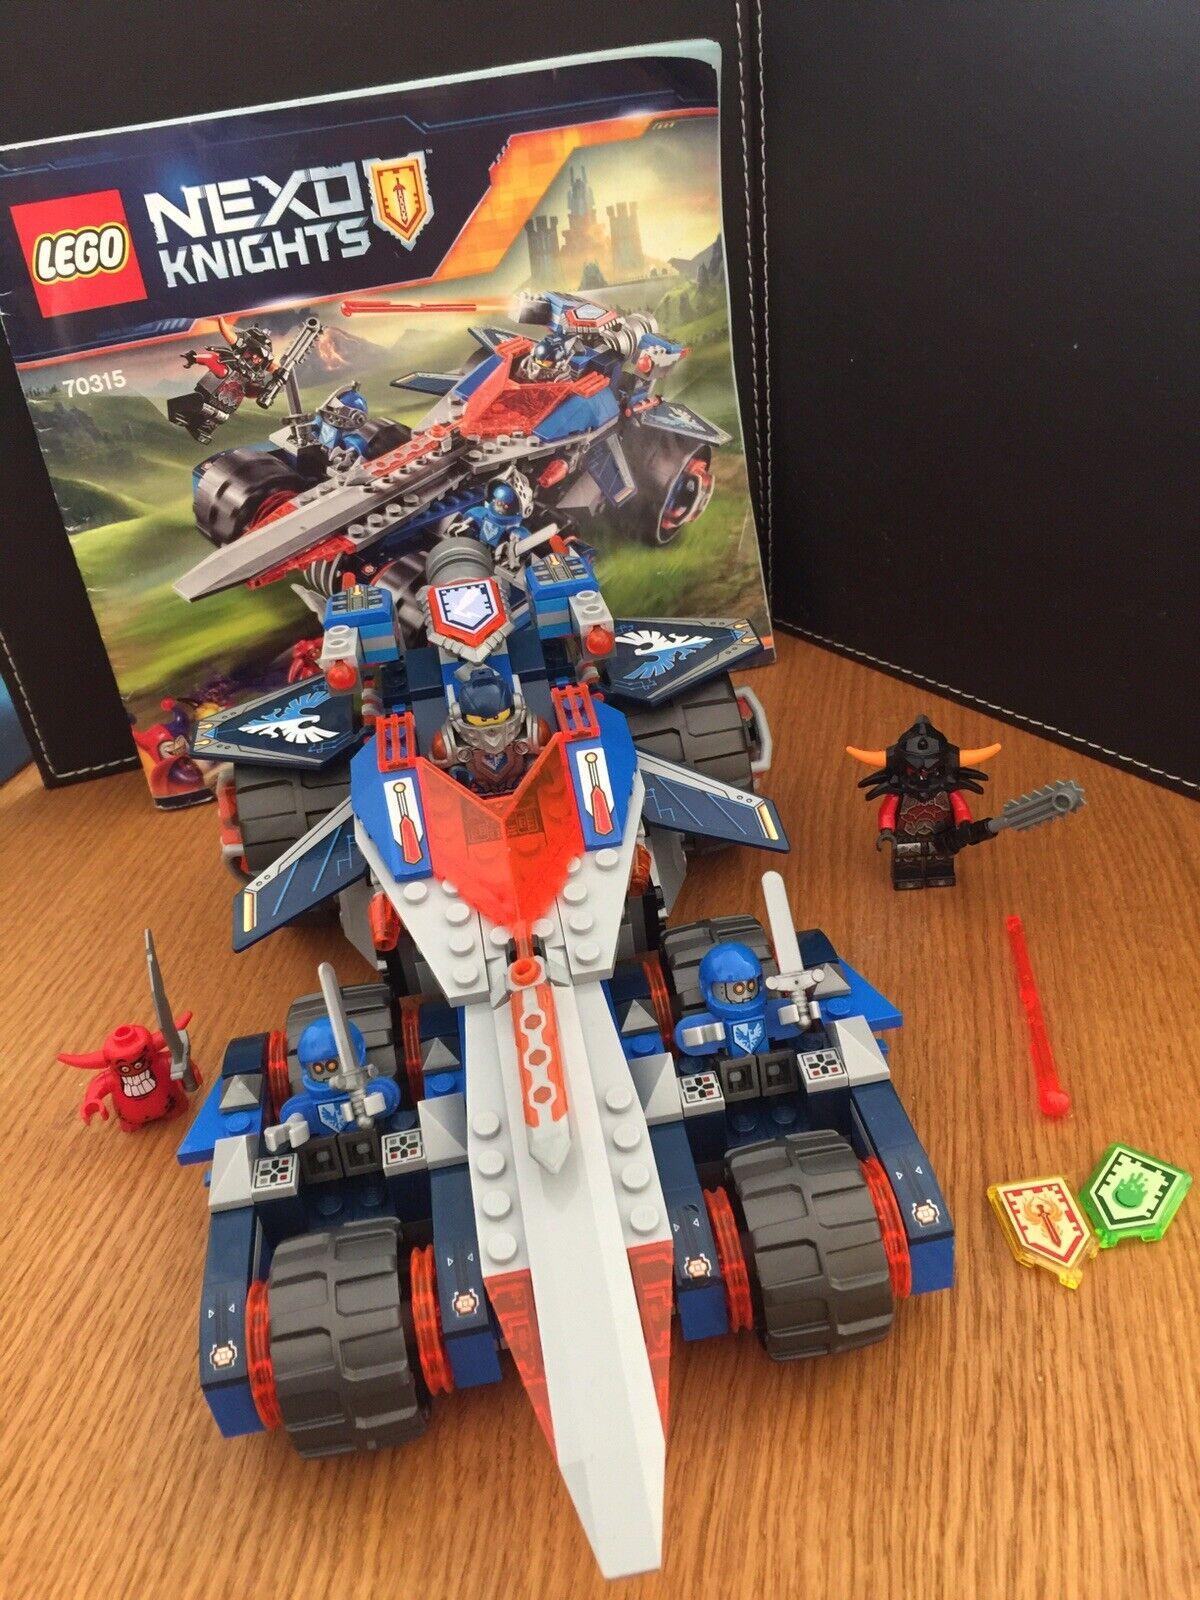 Lego Nexo Knights Set 70315 With Instructions